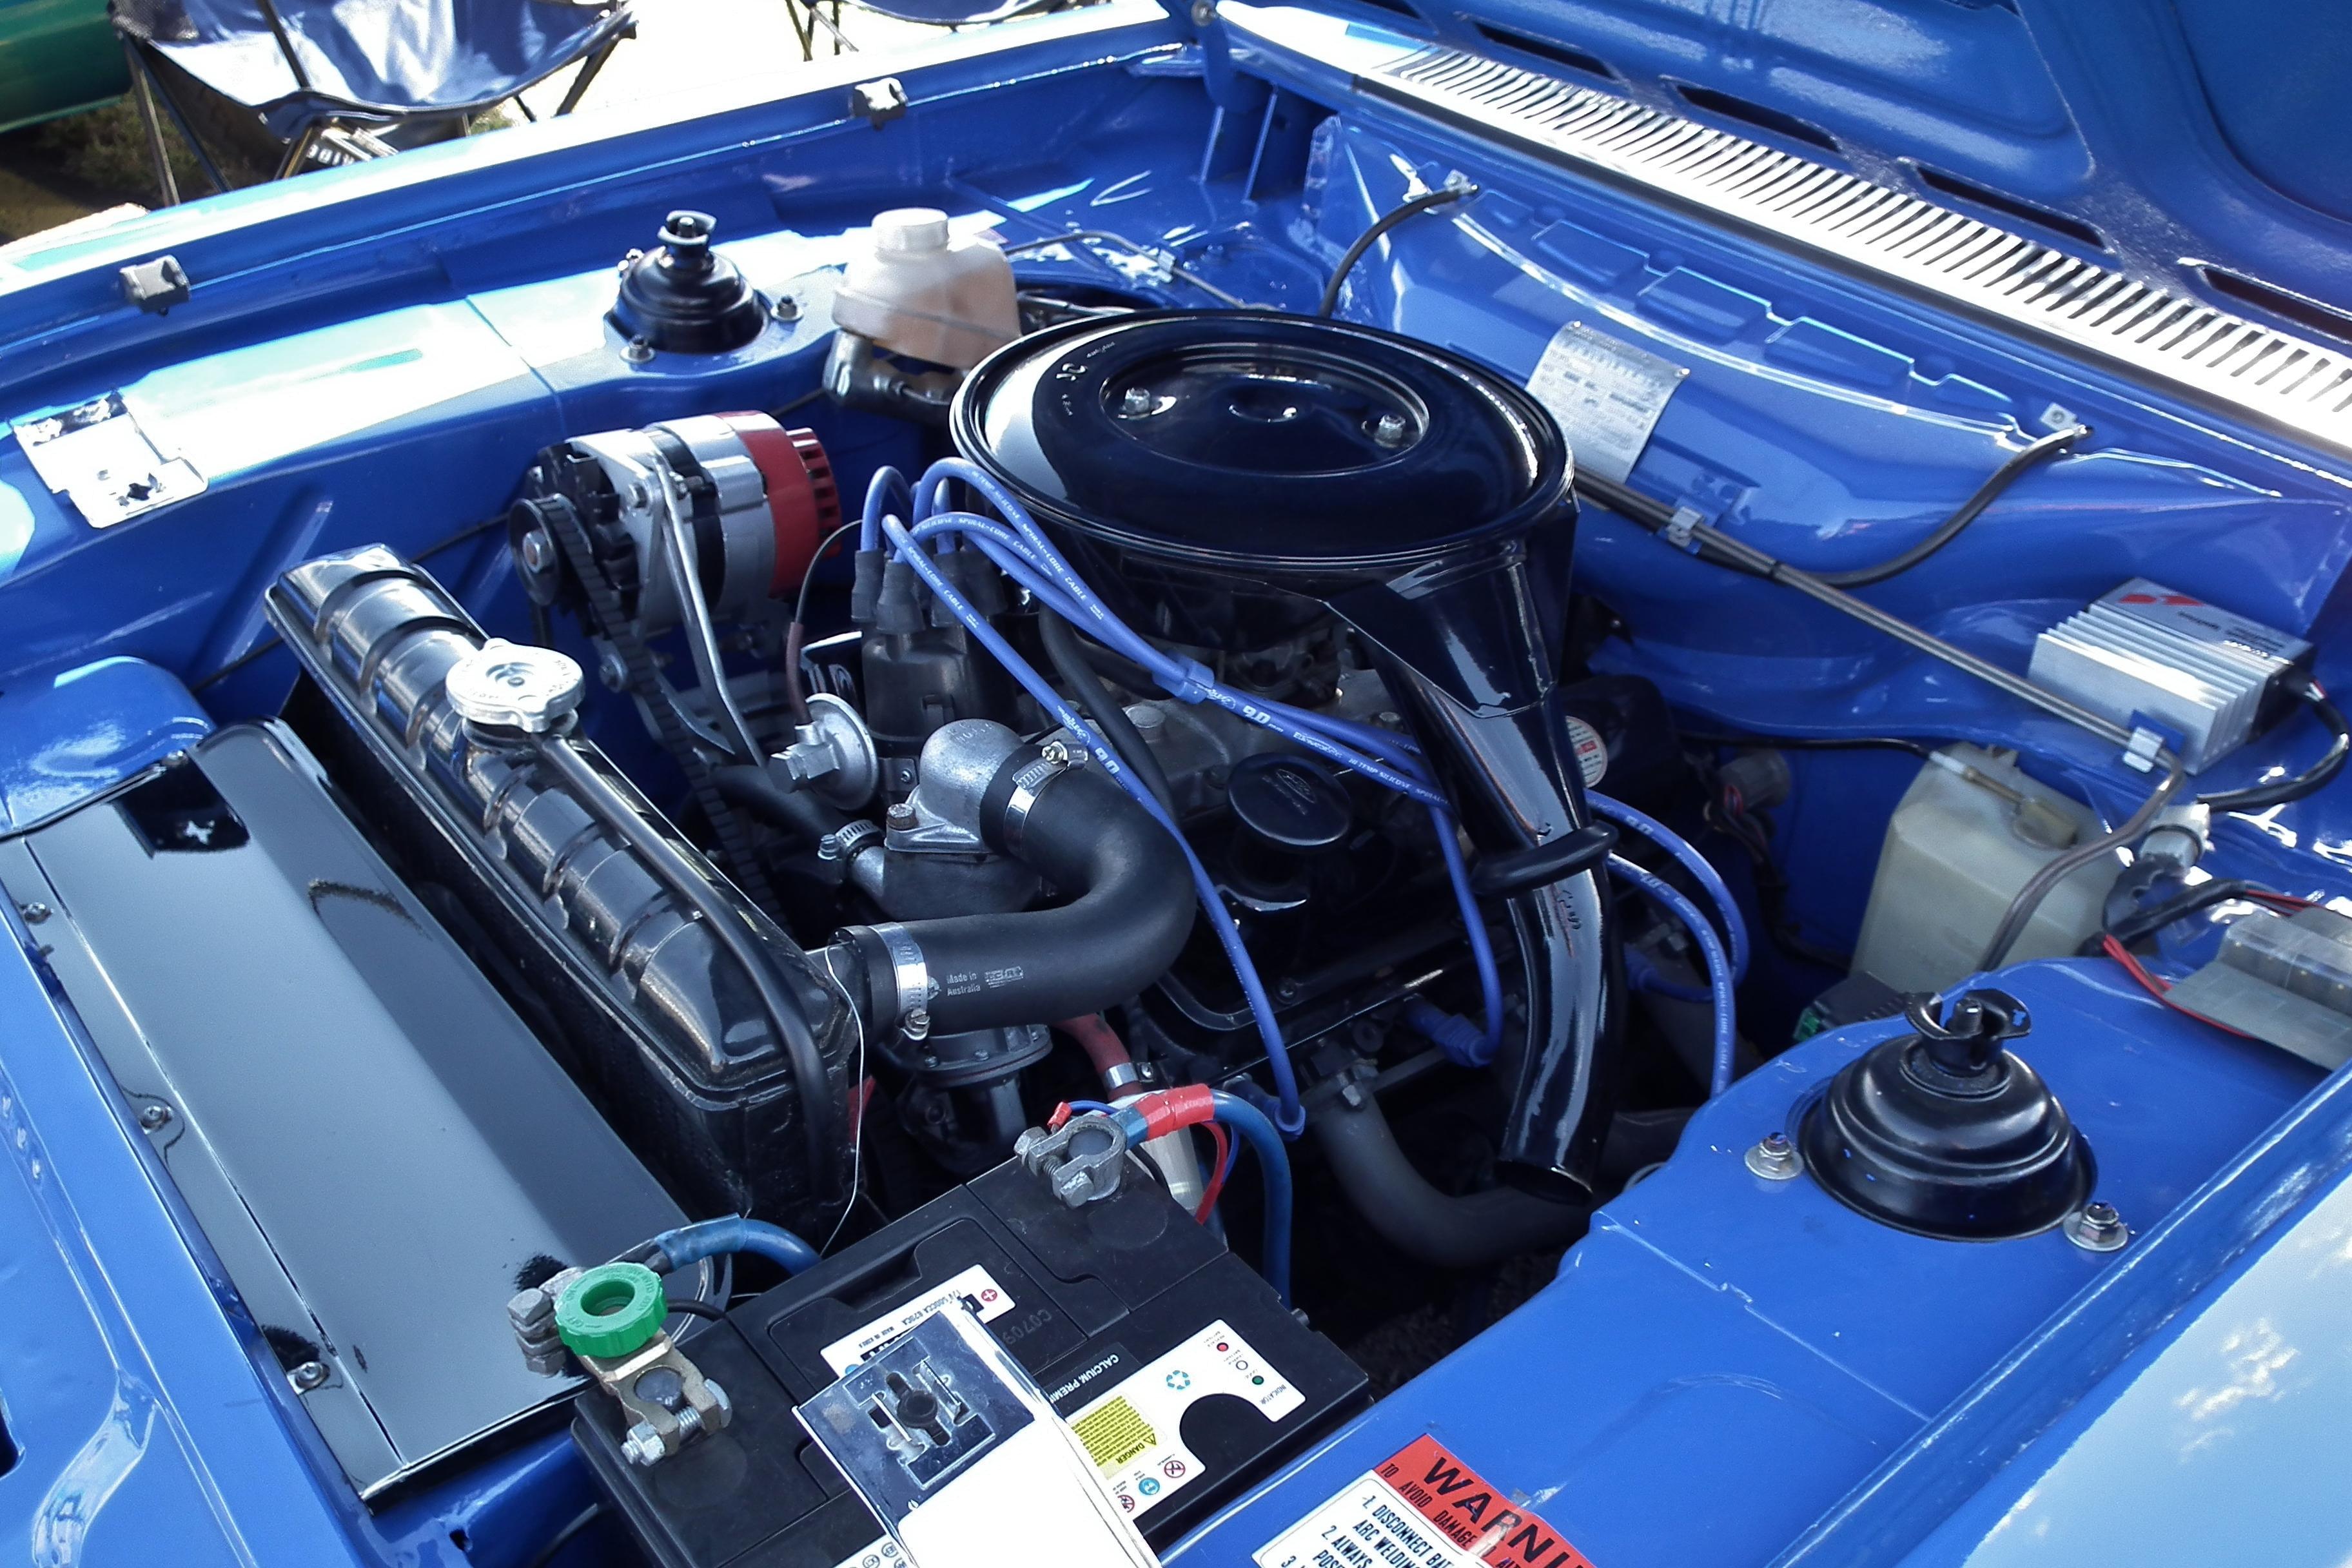 1974 corvette wiring diagram pdf ford essex v6 engine  uk  wikiwand  ford essex v6 engine  uk  wikiwand